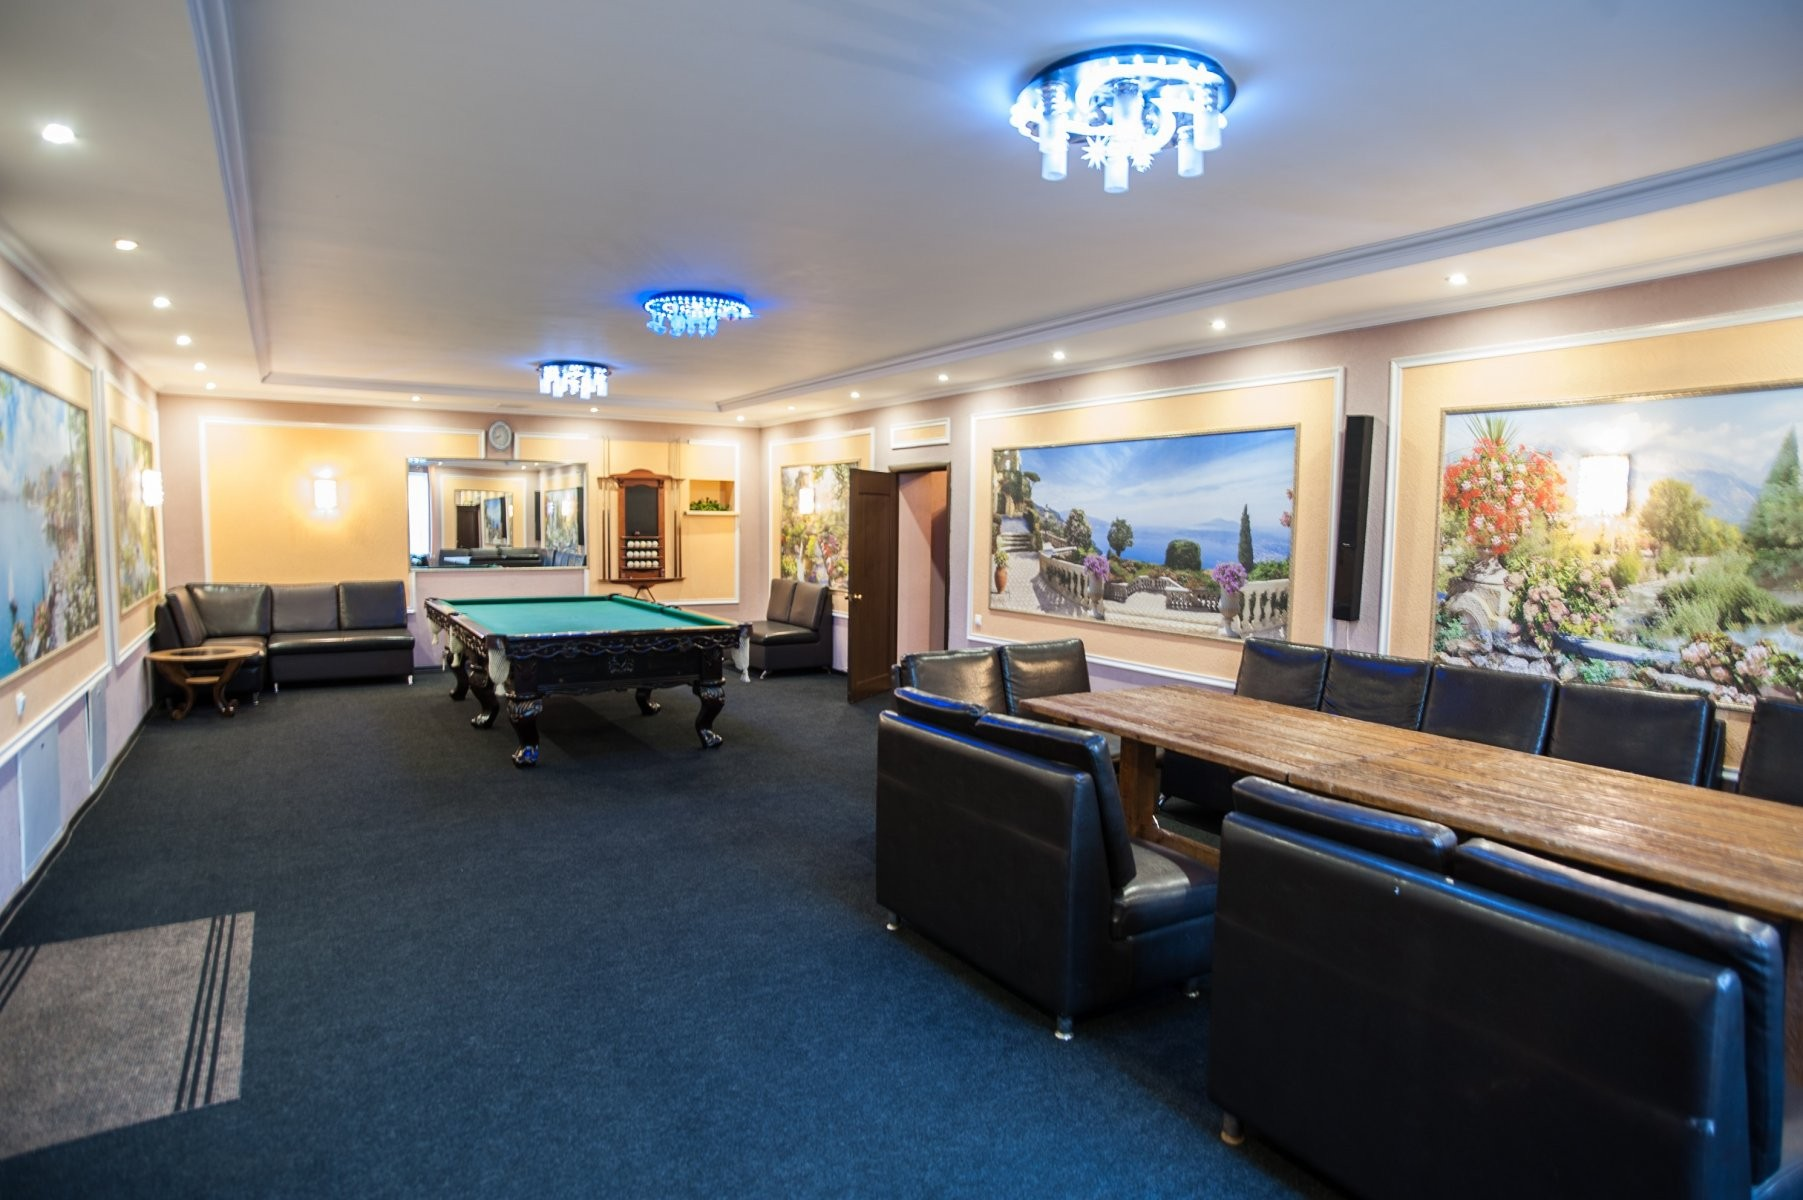 Сауна в гостиничном комплексе Руслан - №3